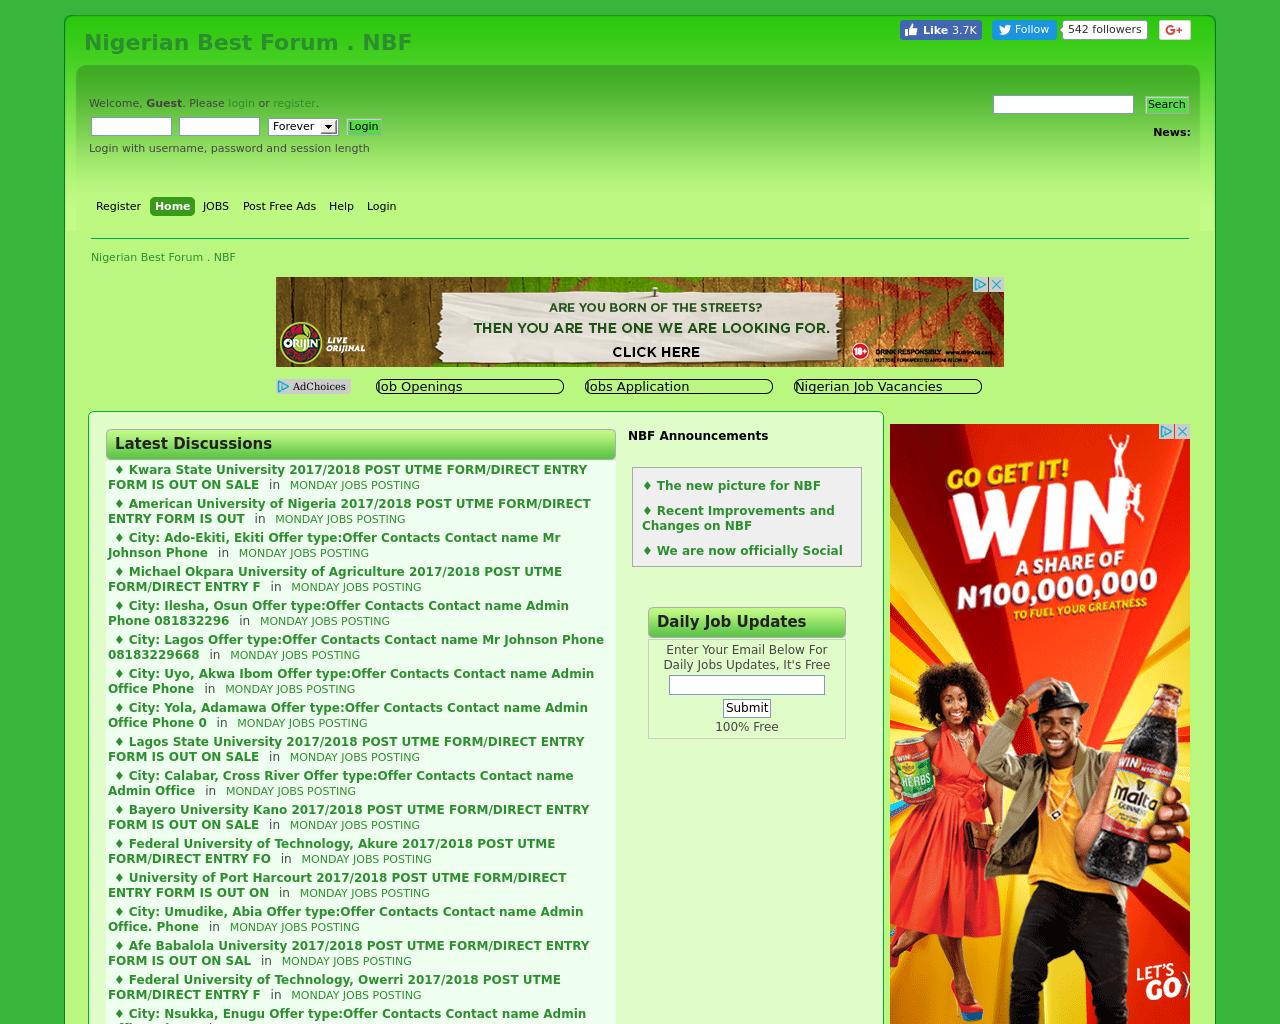 Nigerian-Best-Forum-Advertising-Reviews-Pricing